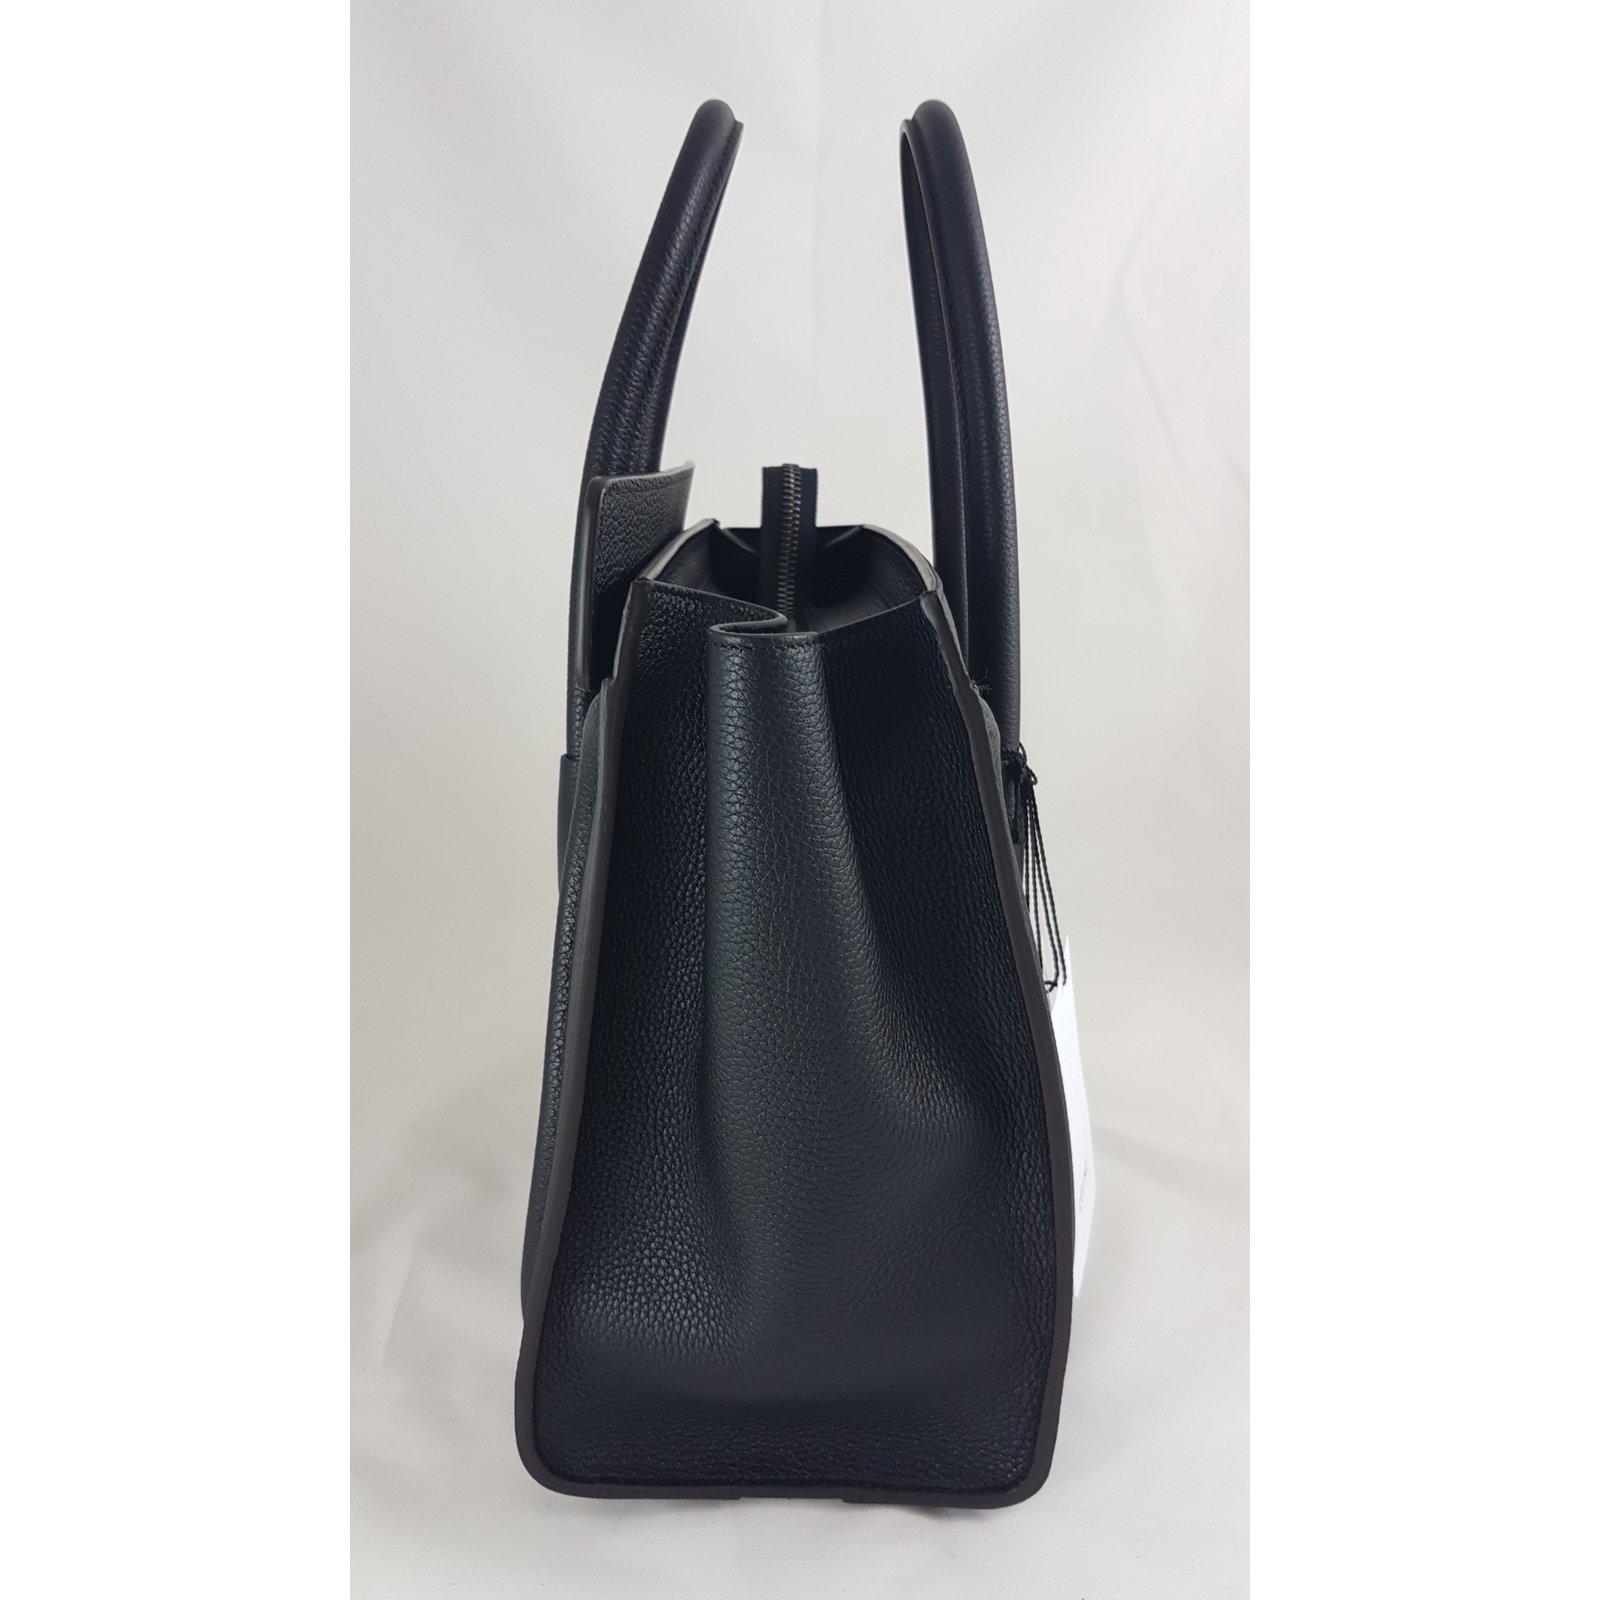 ef698cf0cf644 Céline MICRO LUGGAGE HANDBAG Handbags Leather Black ref.66130 - Joli ...